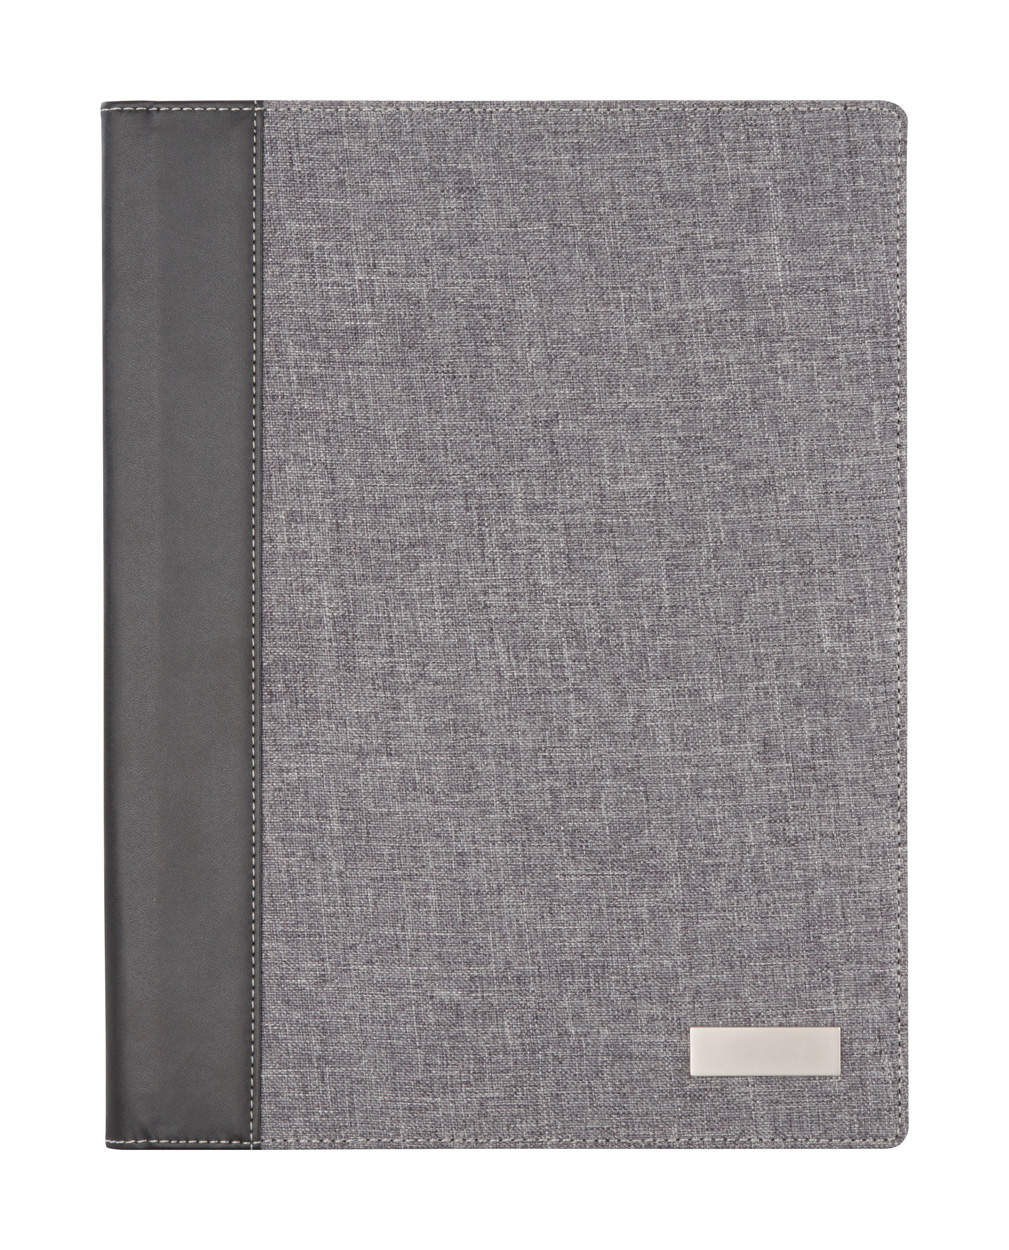 Smokey A4 A4 document folder